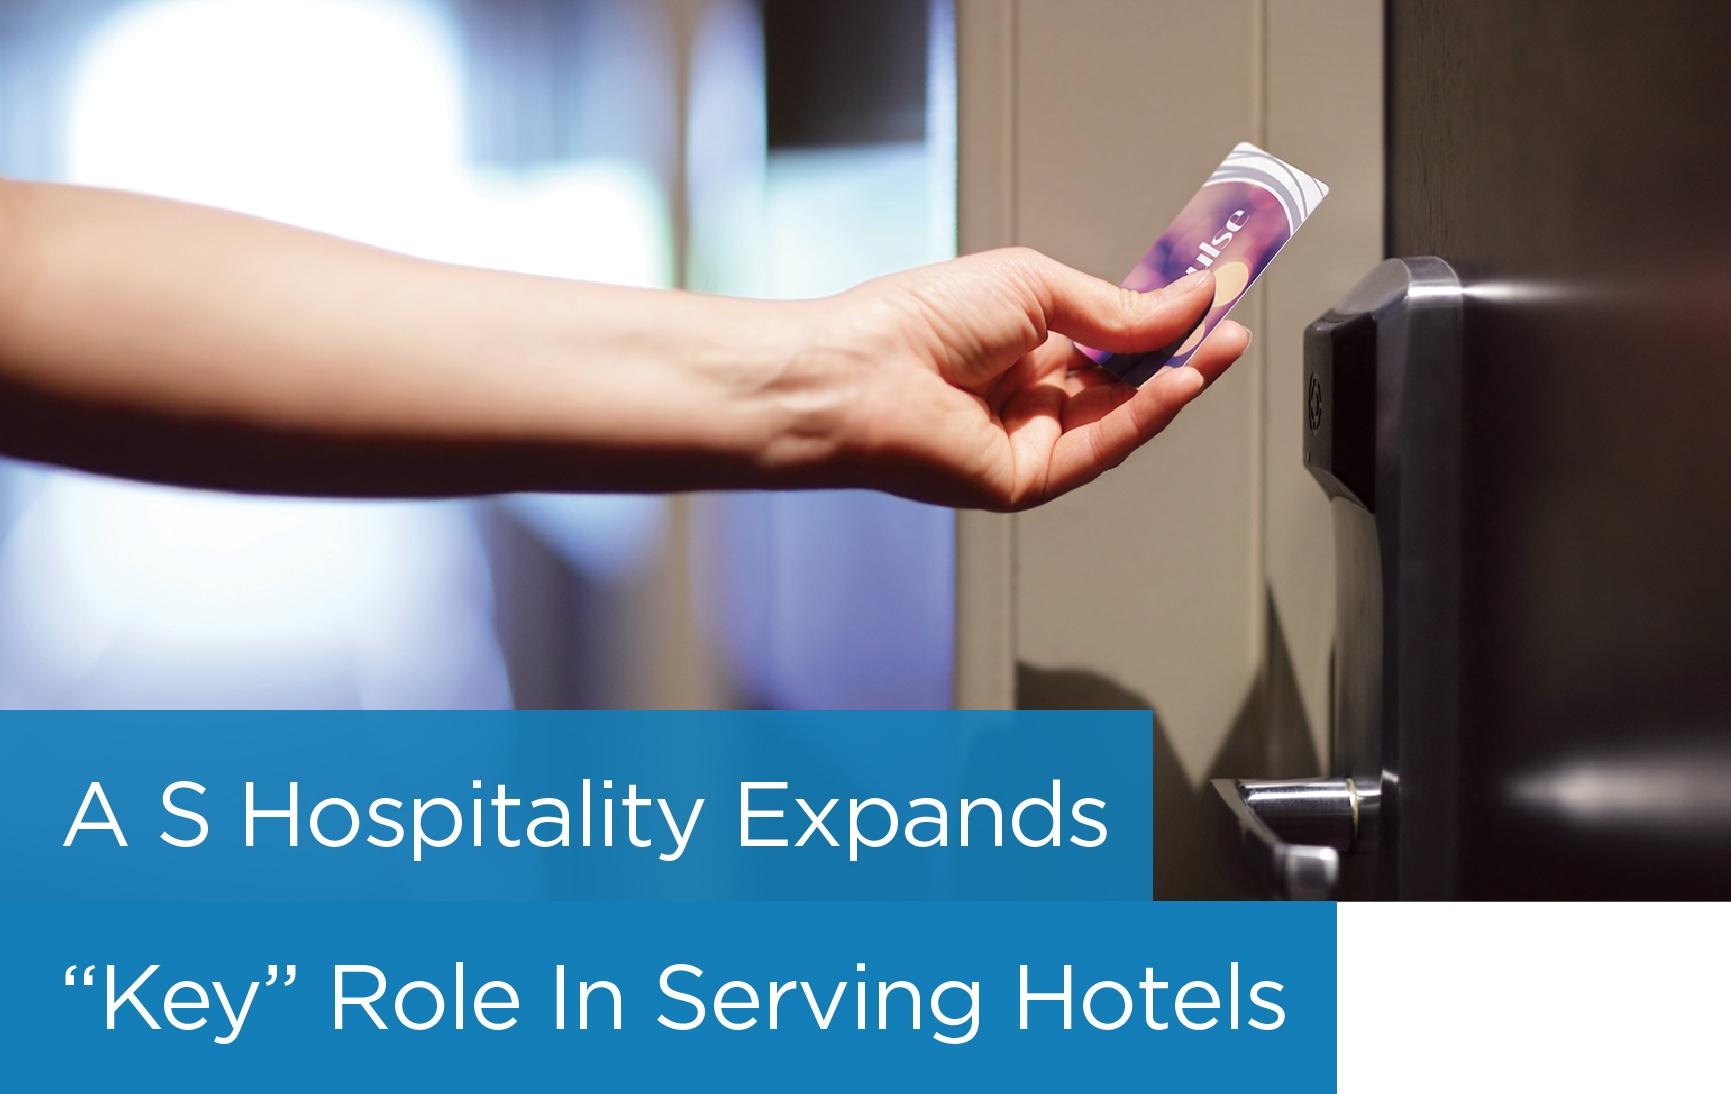 A S Hospitality Expands